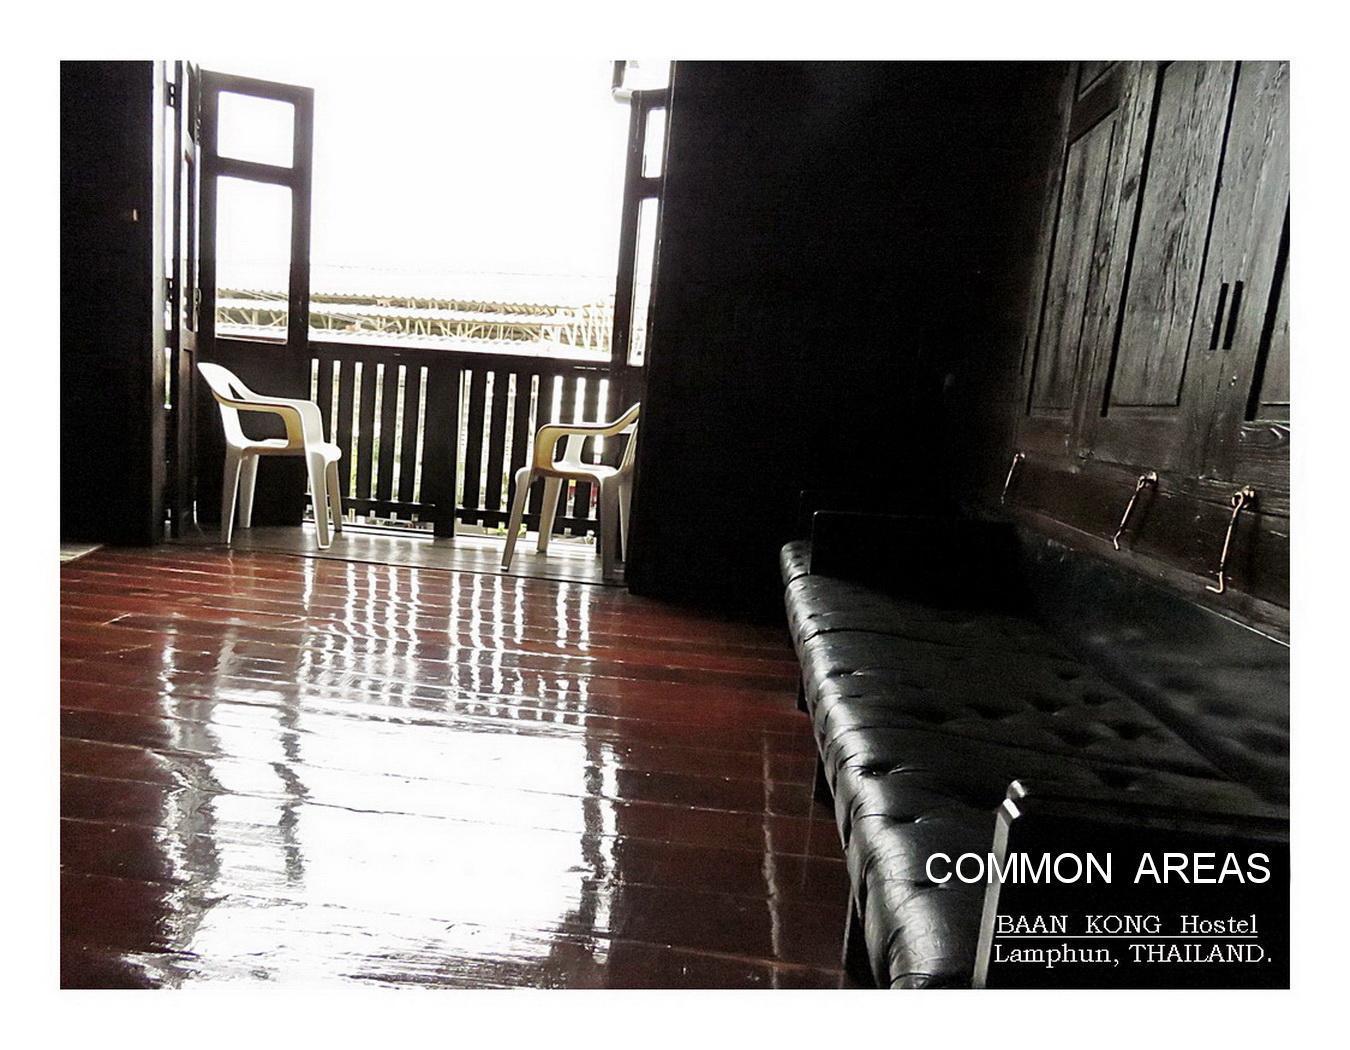 BaanKong Hostel, Muang Lamphun